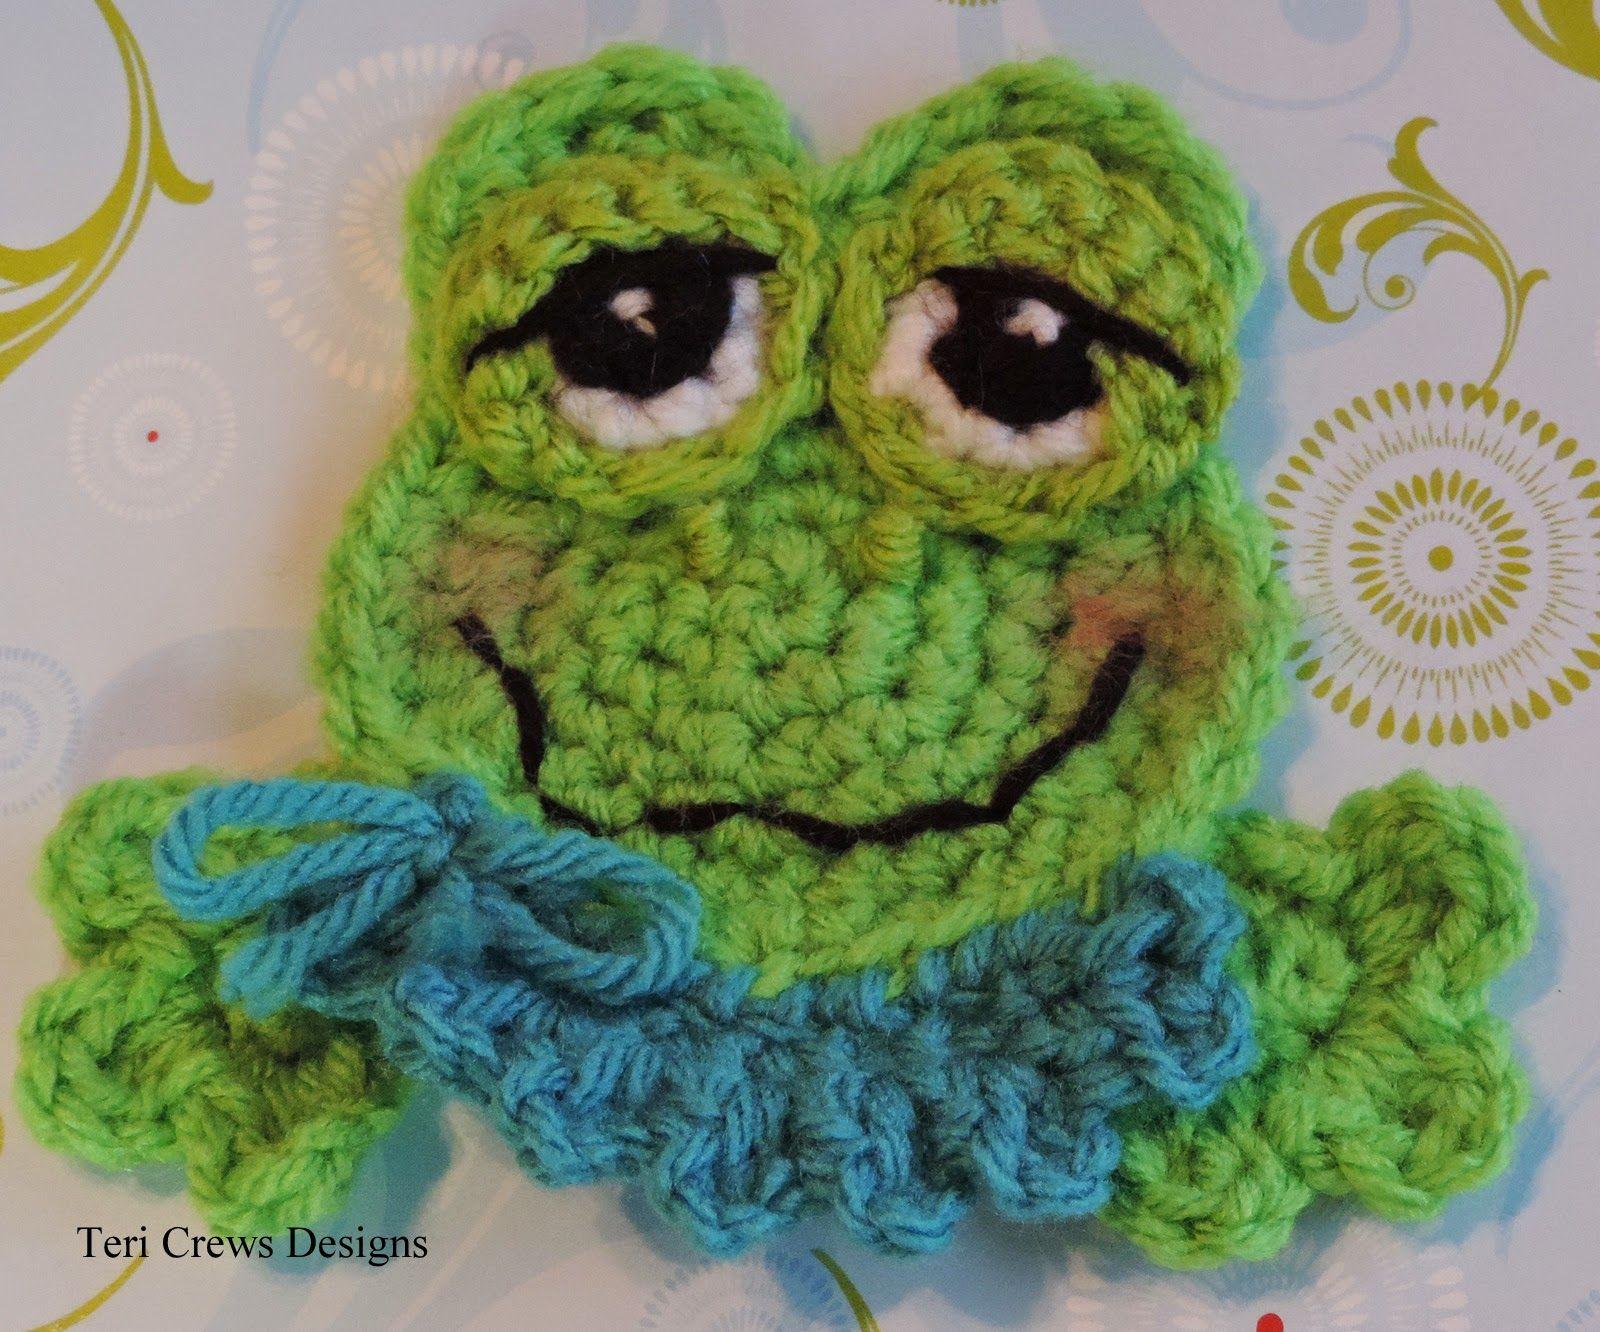 New Cute Frog Applique Crochet Pattern | Cute Crochet and Knitting ...